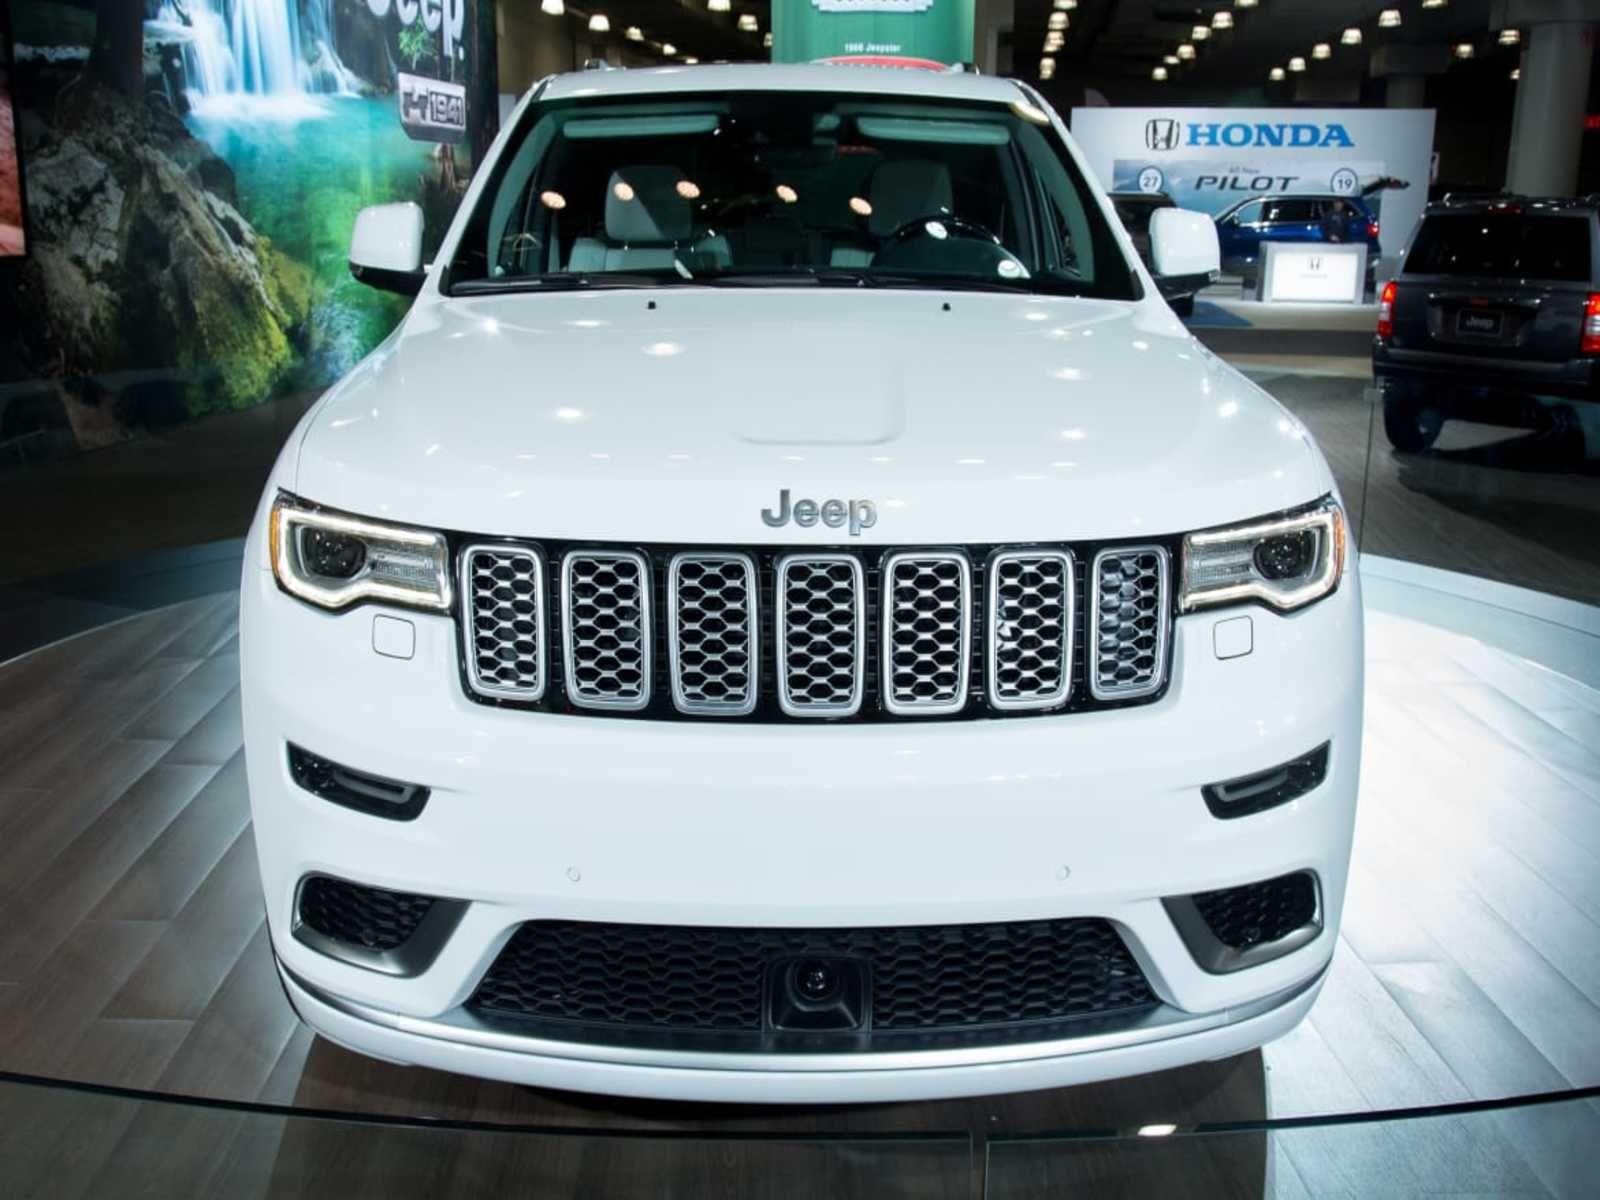 Jeep Cherokee 3Rd Row >> Grand Jeep Cherokee 3rd Row Seating World Car Brands Jeep